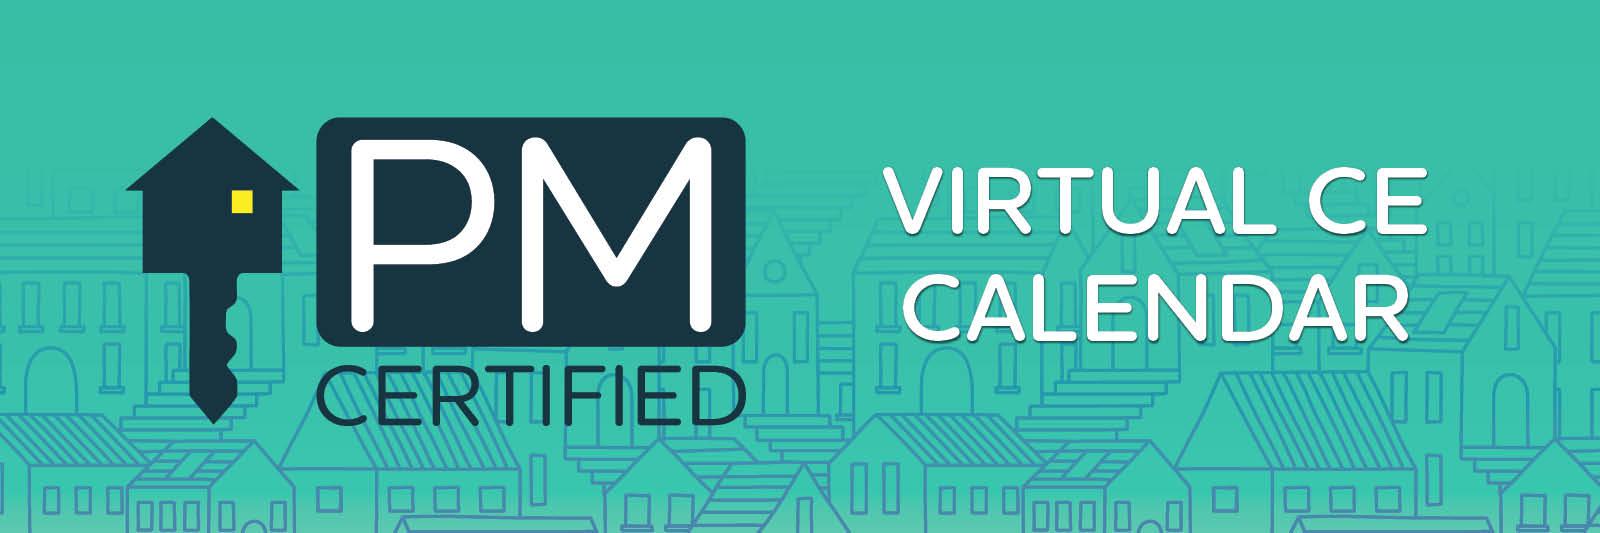 PM Cert Virtual CE Calendar